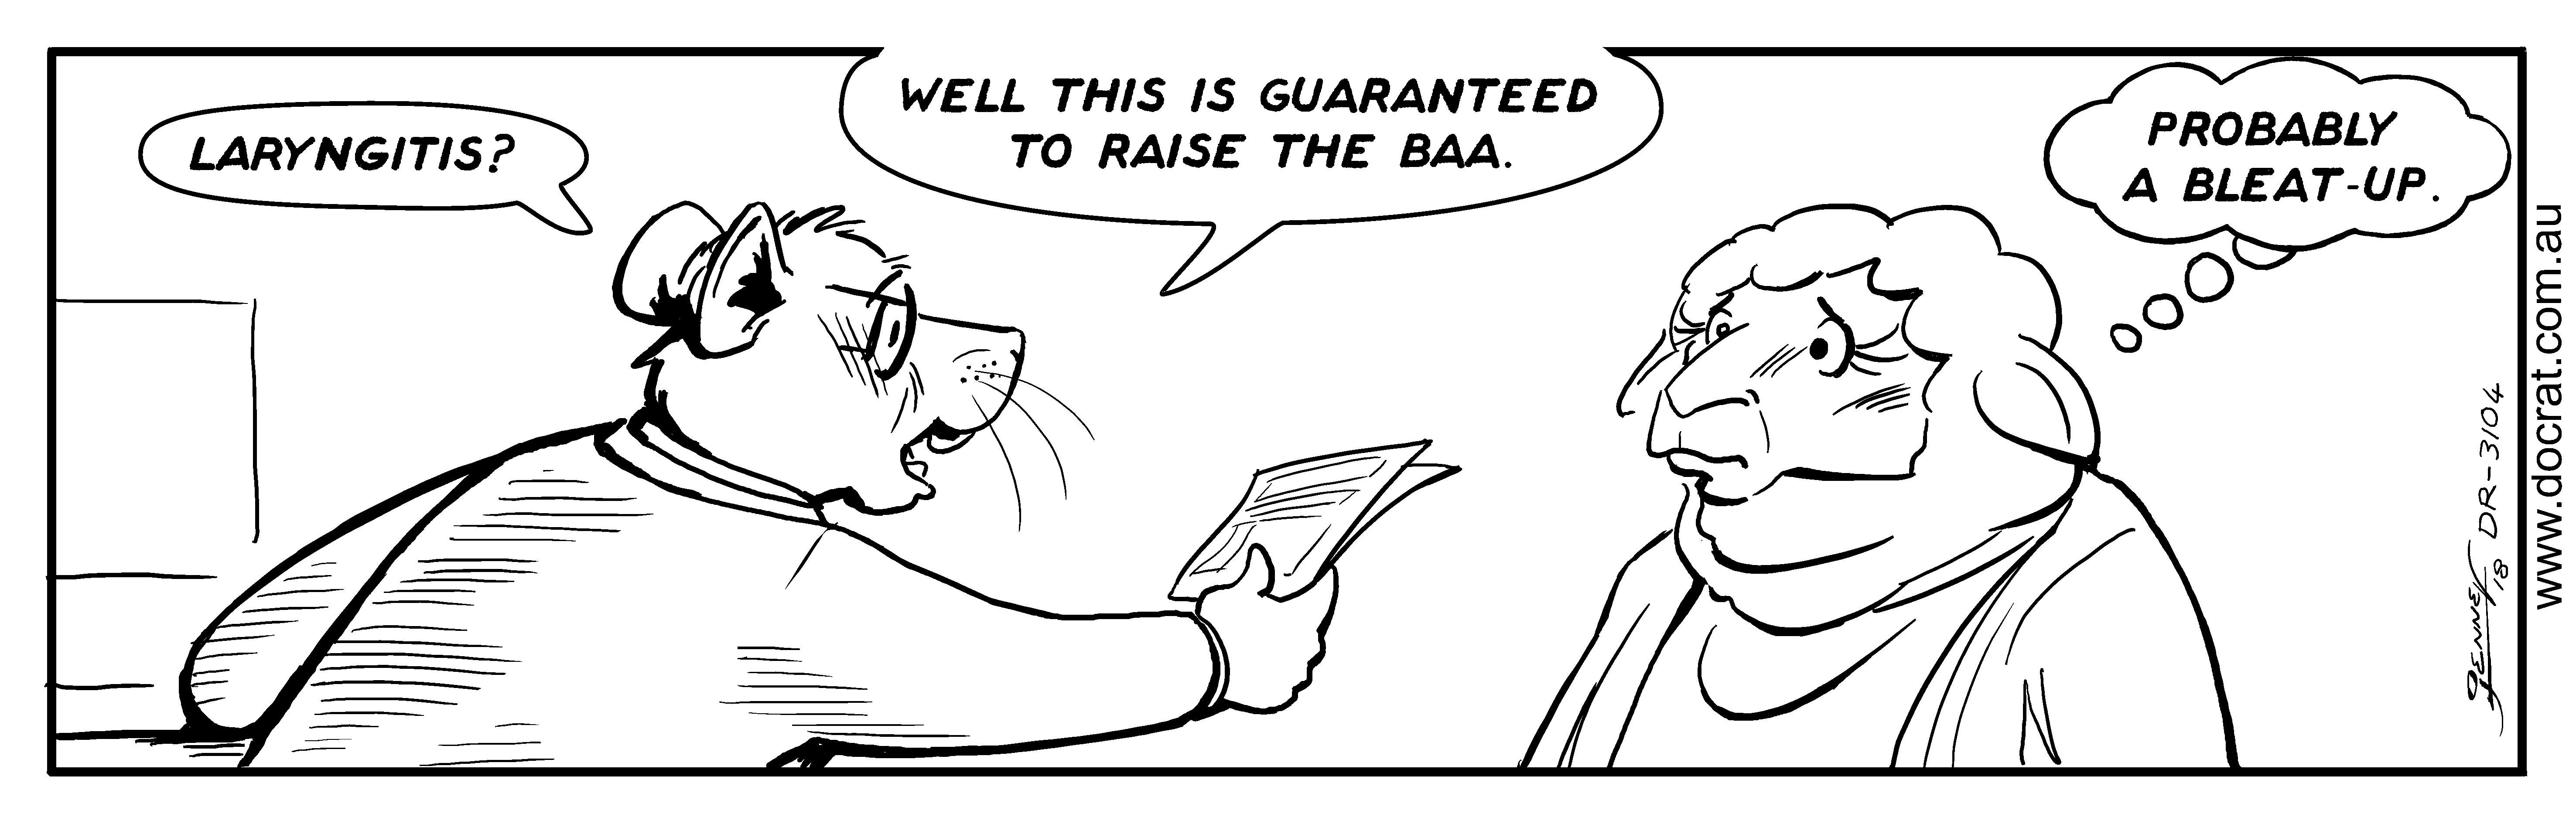 20181101